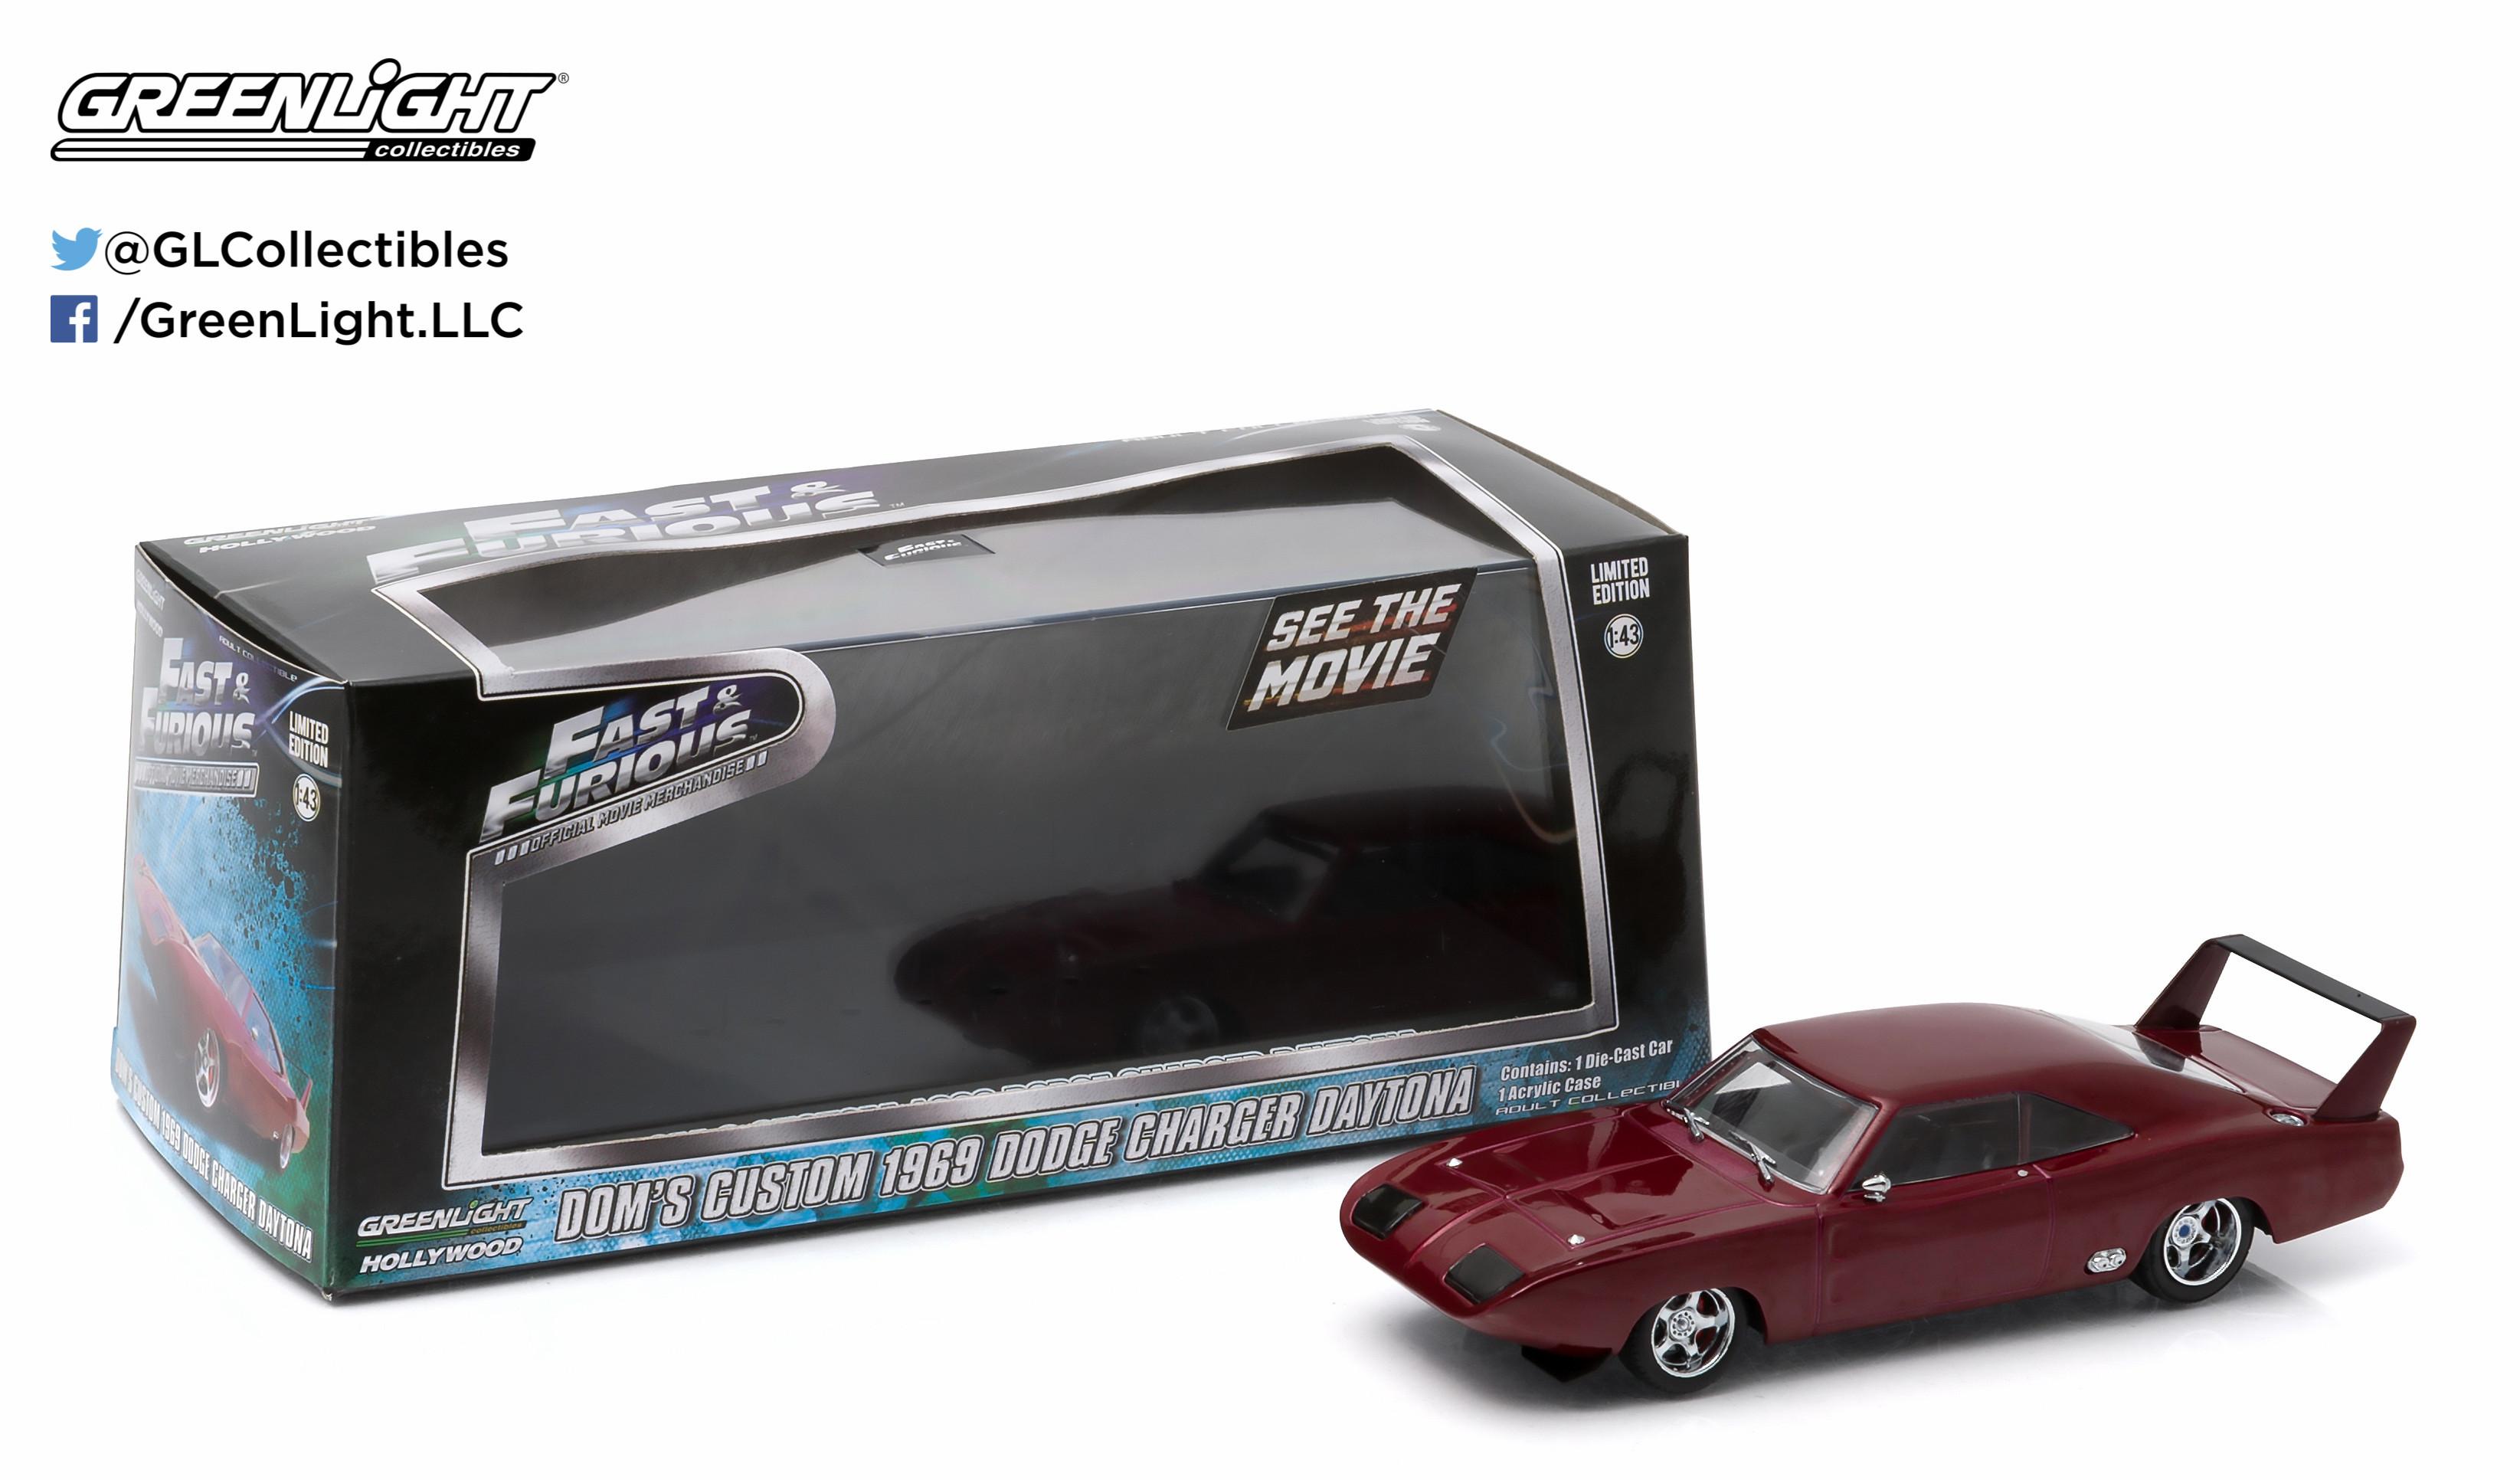 Greenlight Hollywood - Dom's Custom 1969 Dodge Charger Daytona - Fast and Furious - Escala 1:43